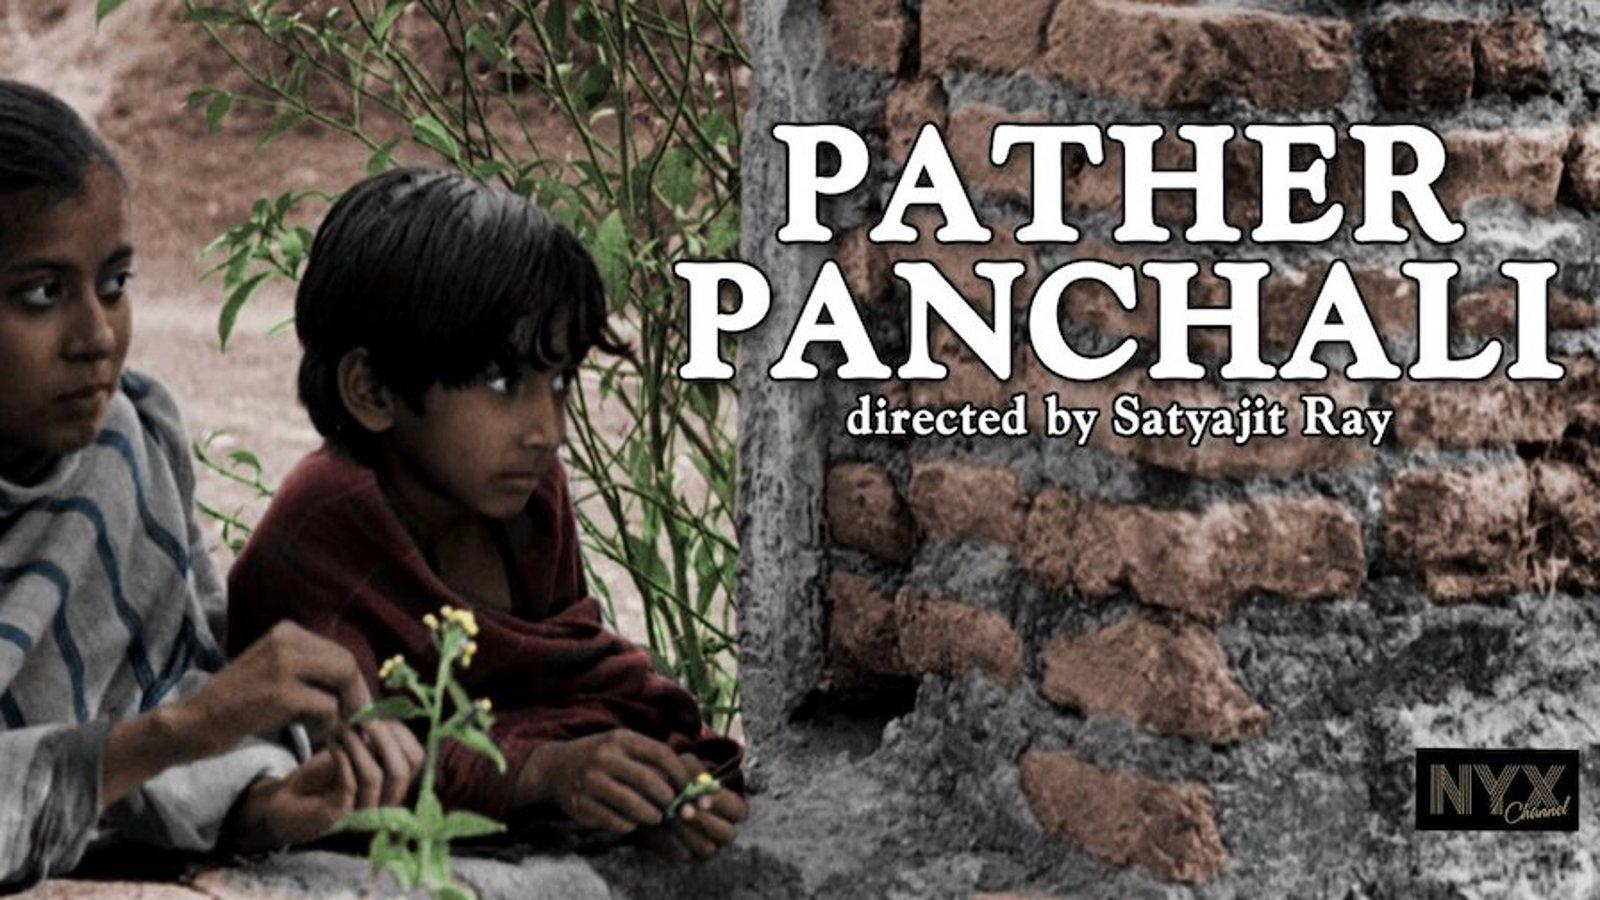 Pather Panchali